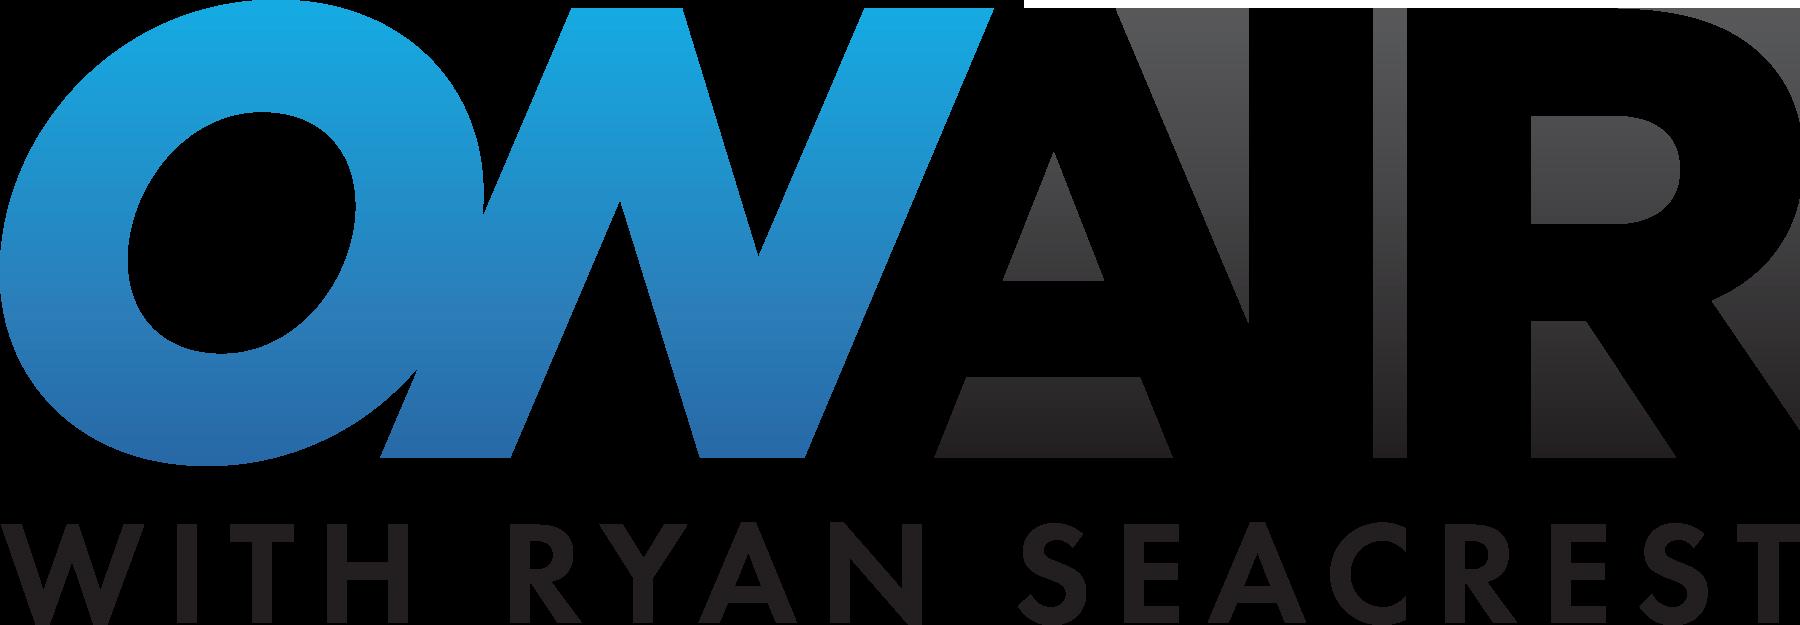 4 - Ryan Secrest 2.png